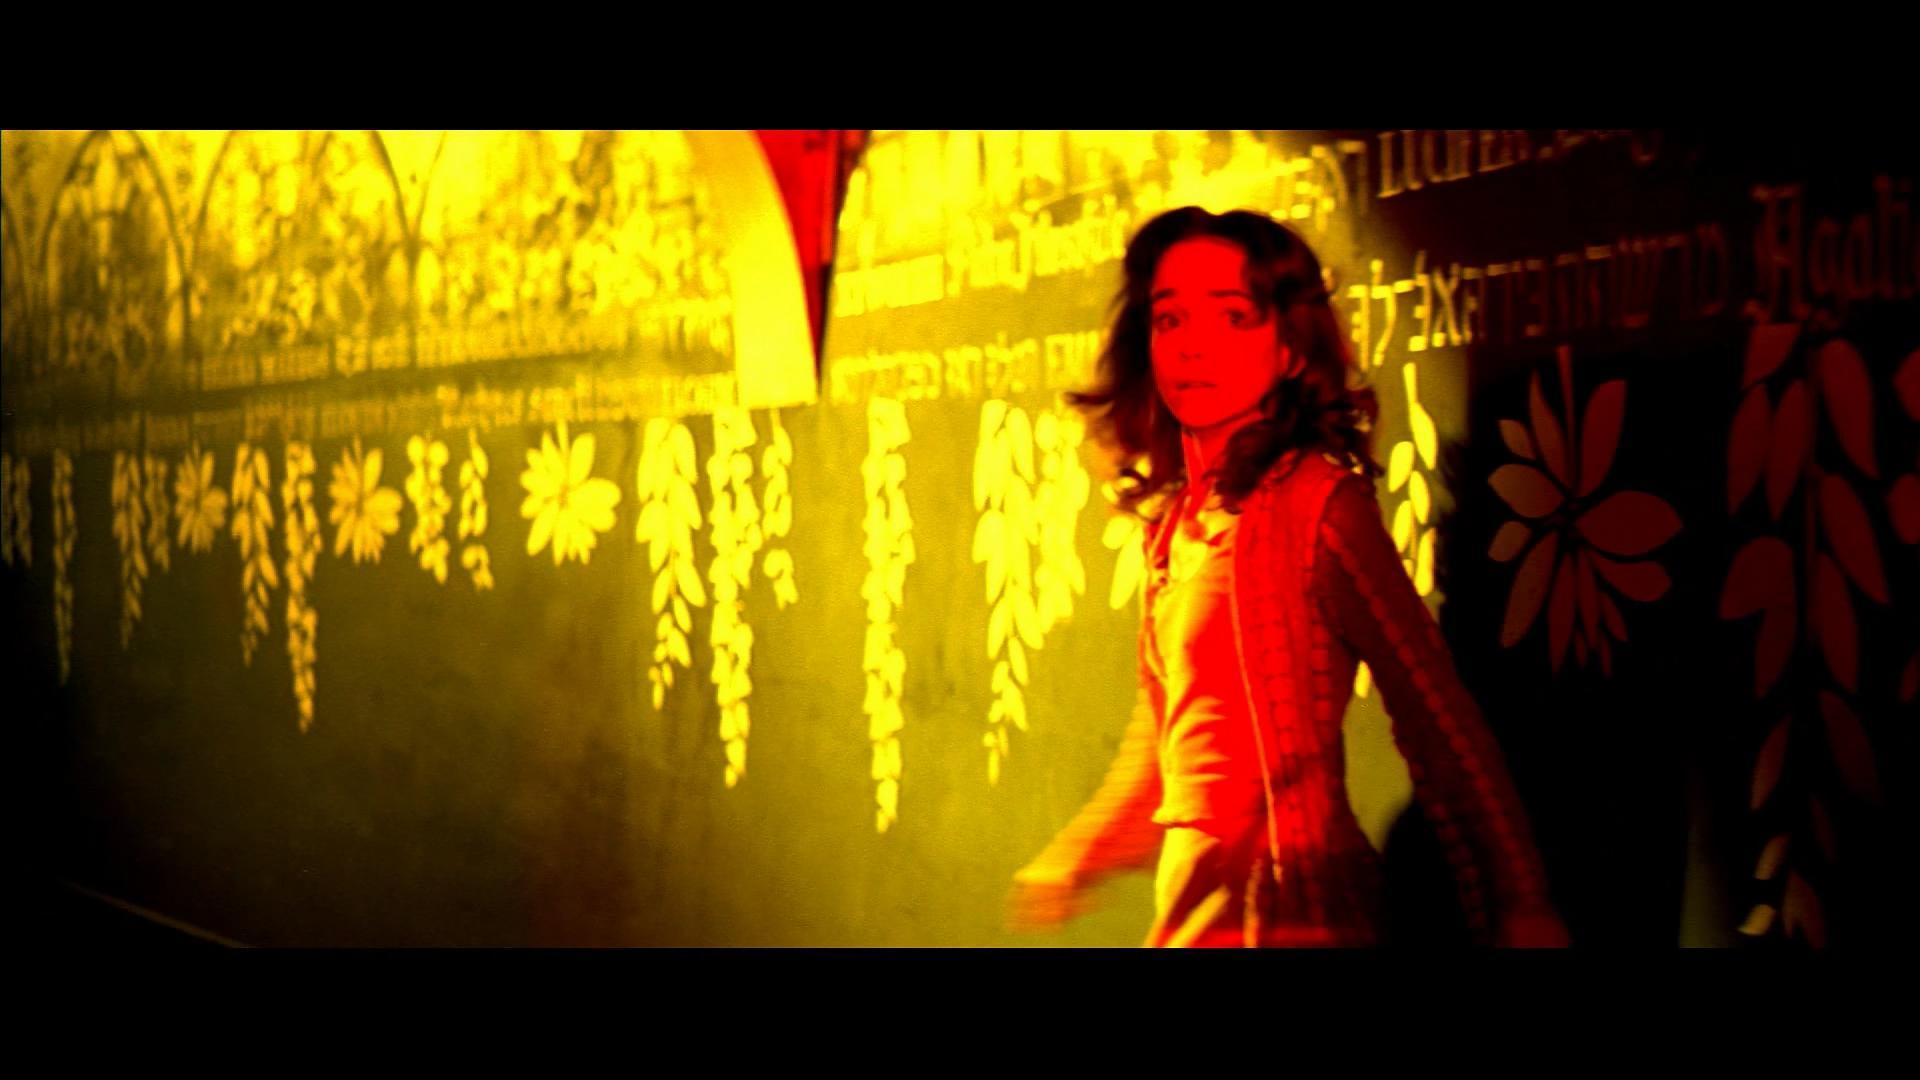 Bad Ladies & The Wild Lovers - Bad Ladies & The Wild Lovers